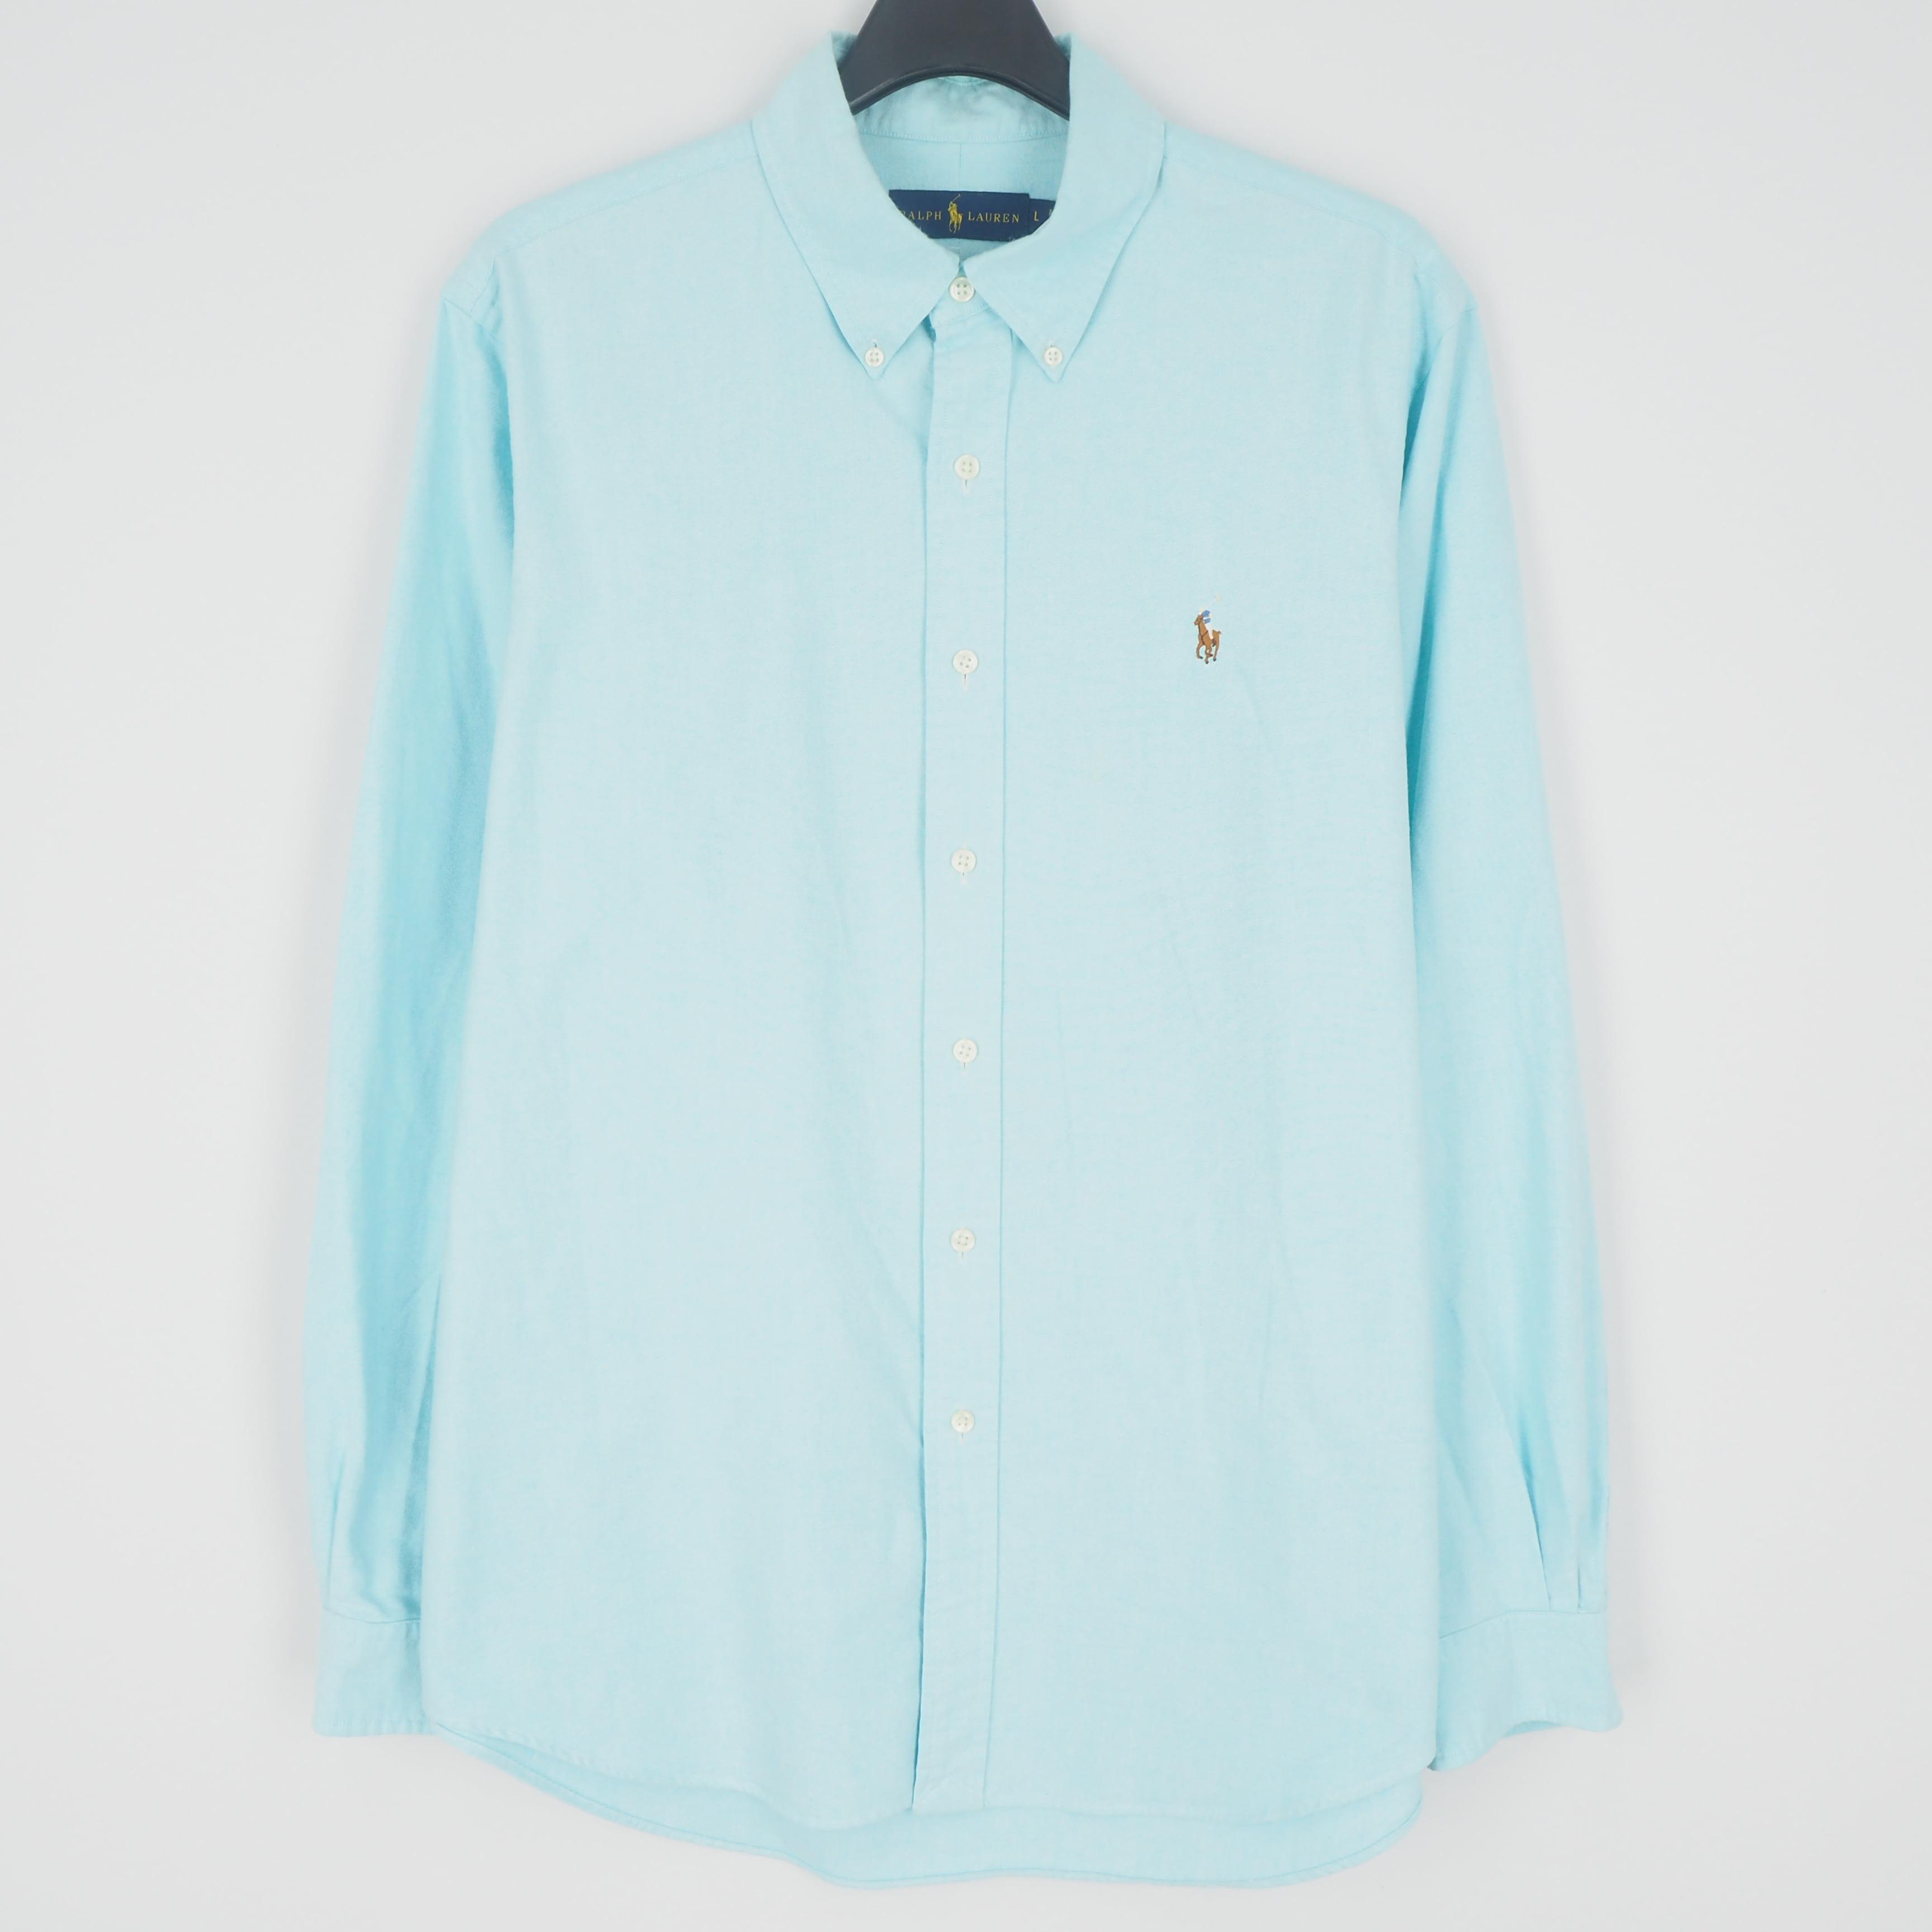 [XL] 랄프로렌 긴팔 셔츠